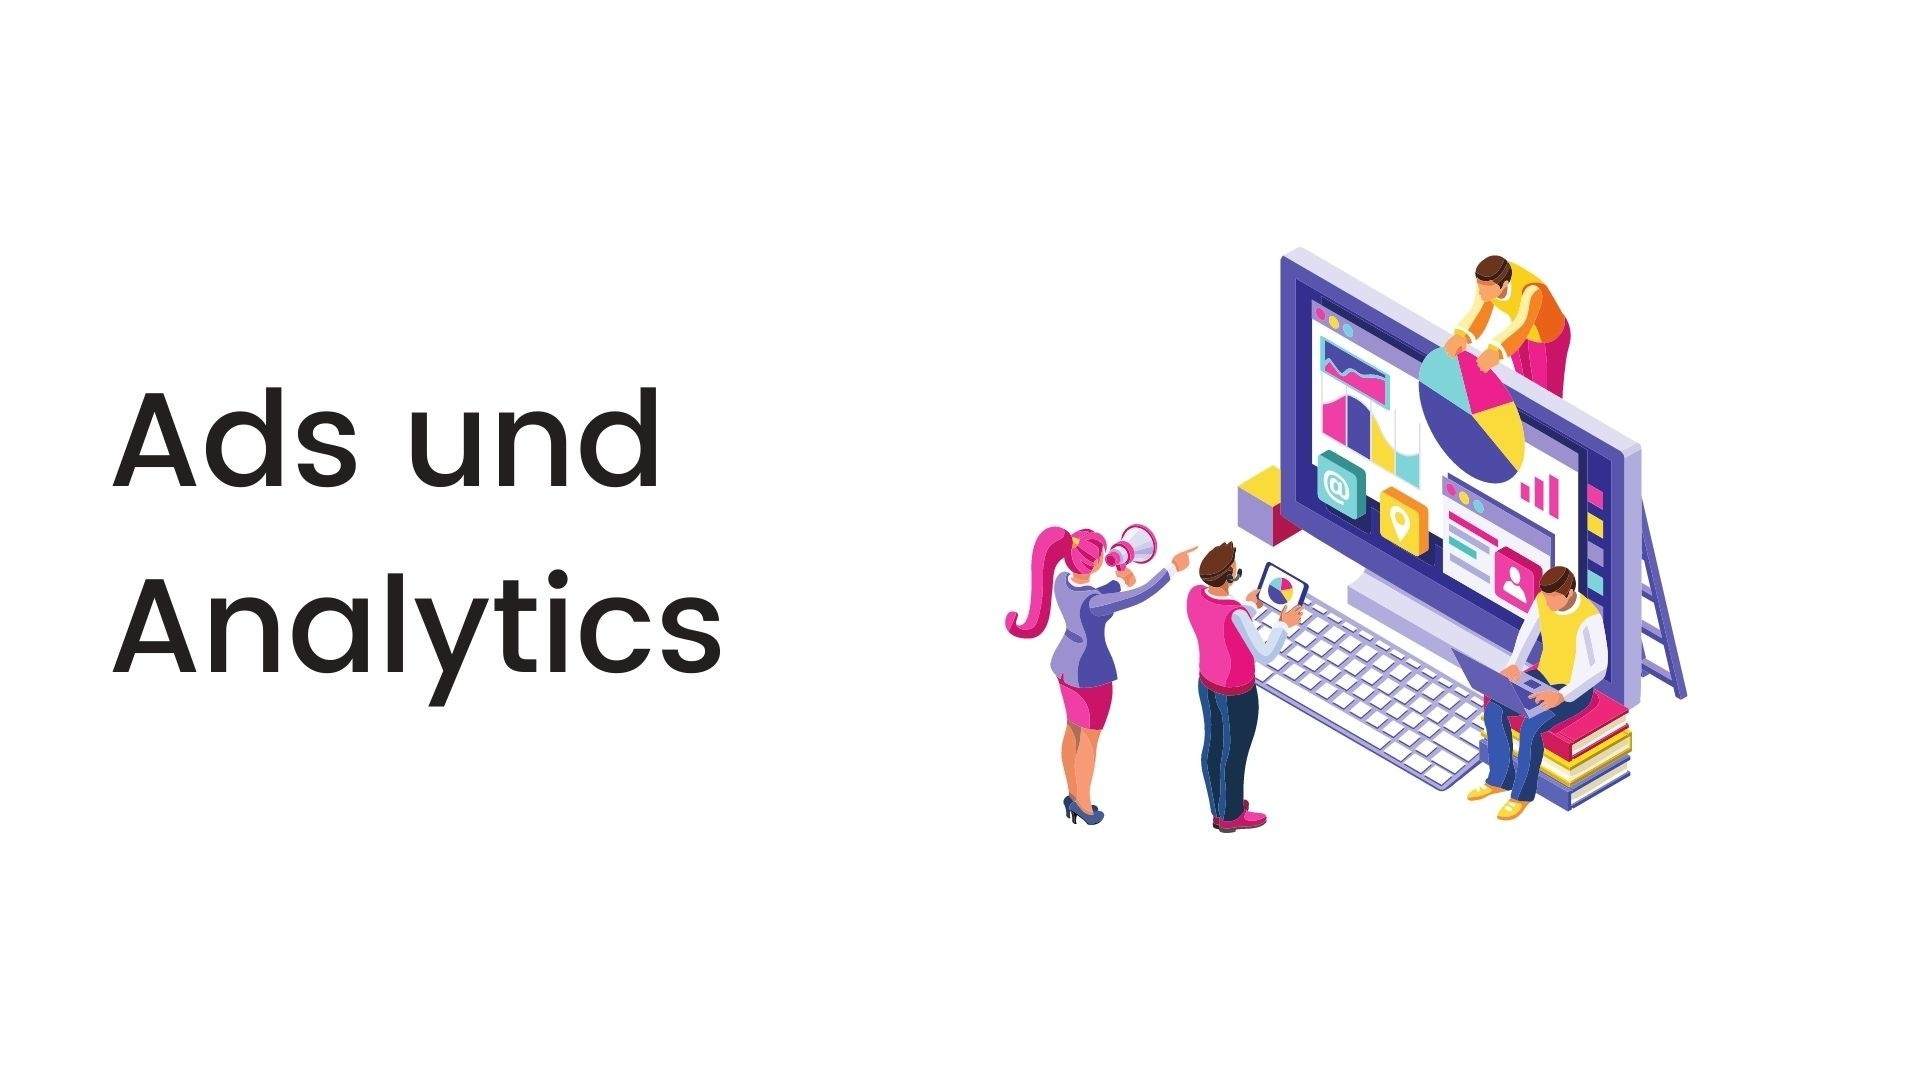 Digital_Coach_Academy_Personal_Branding_Architect_Ads_Analytics